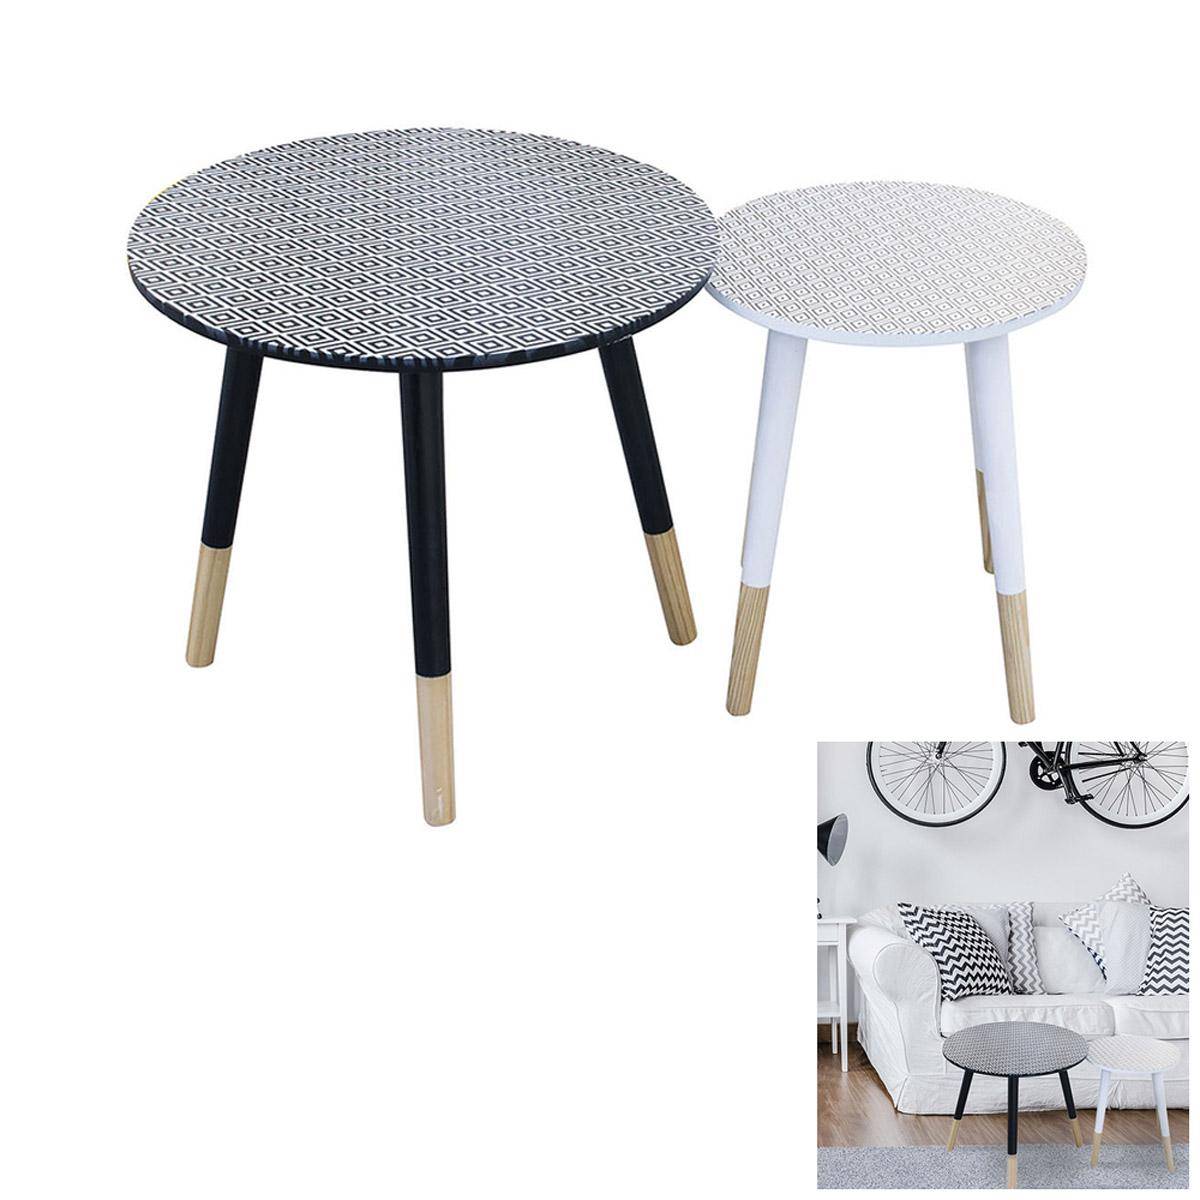 2 tables gigognes bois \'Boho\' noir blanc - 48 et 33 cm - [R2398]